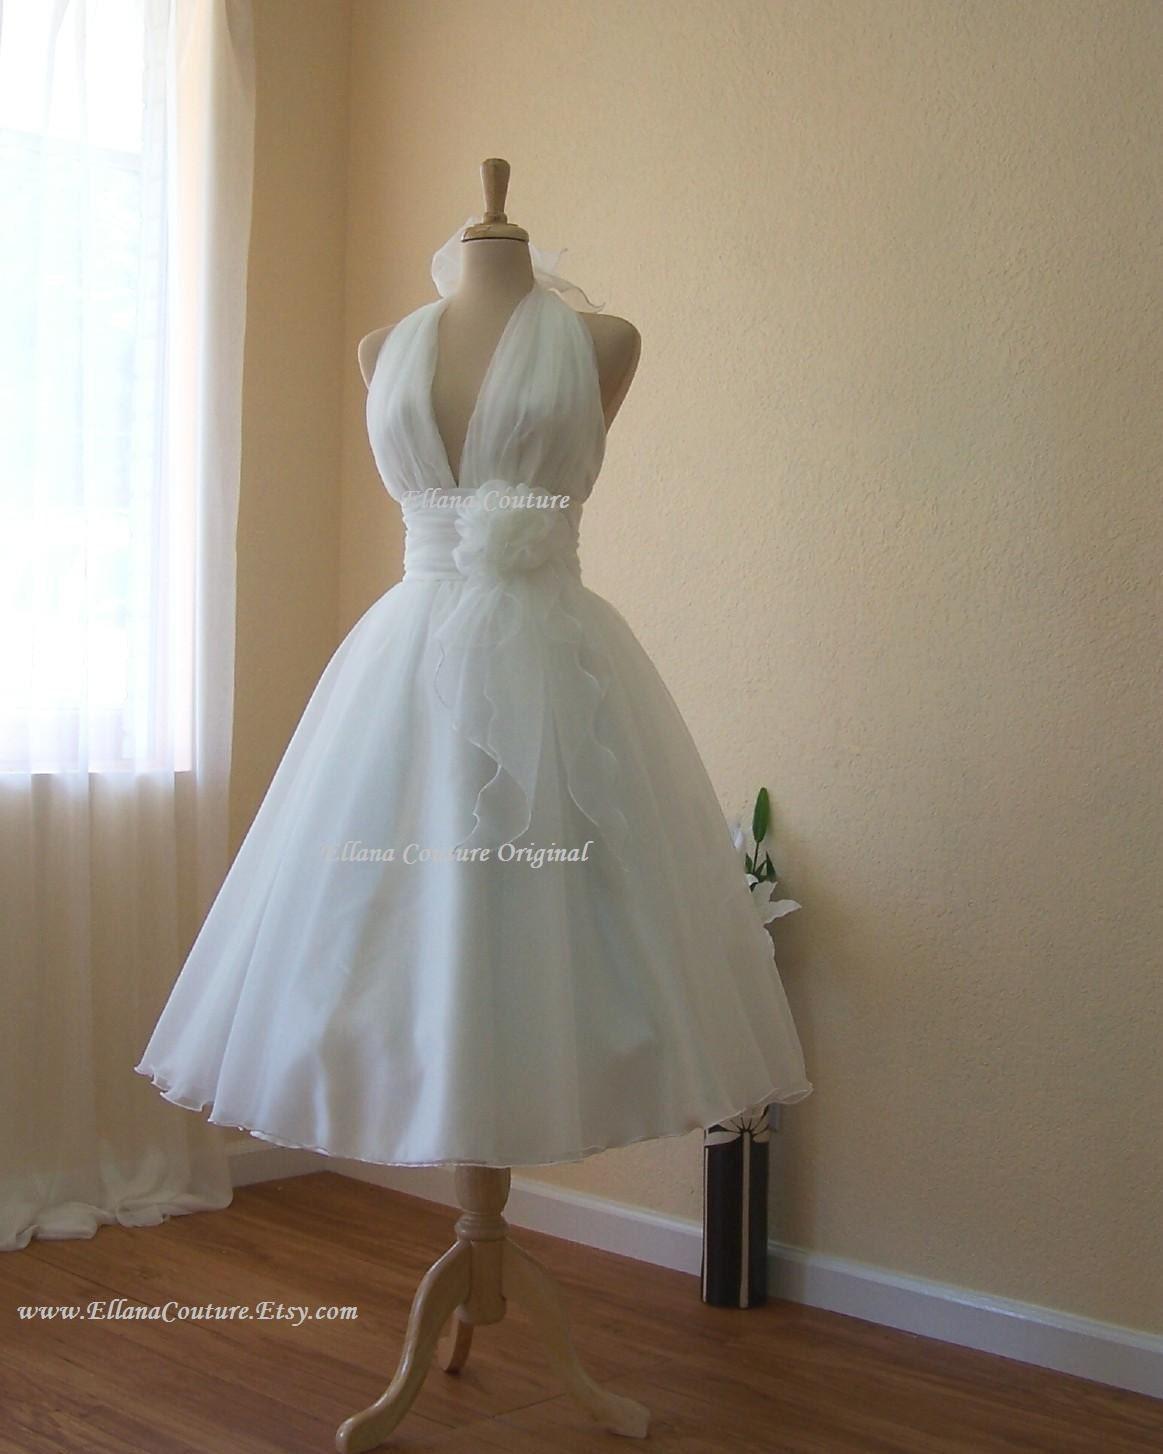 Lily Retro Inspired Tea Length Wedding Dress Vintage Style